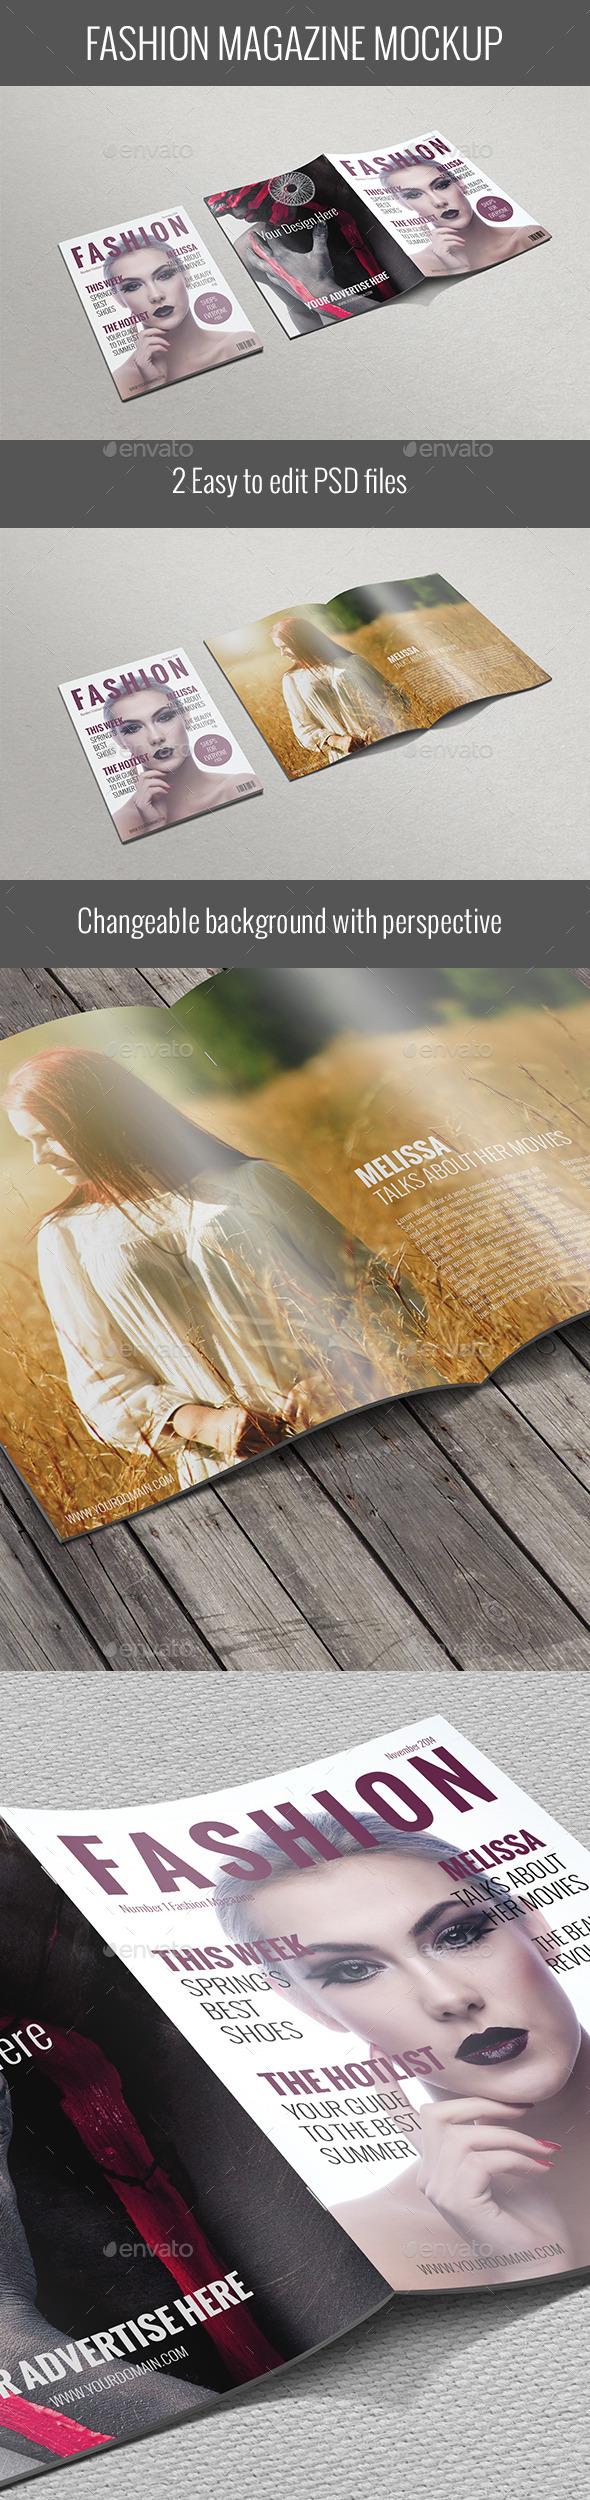 Fashion Magazine Mockup - Magazines Print